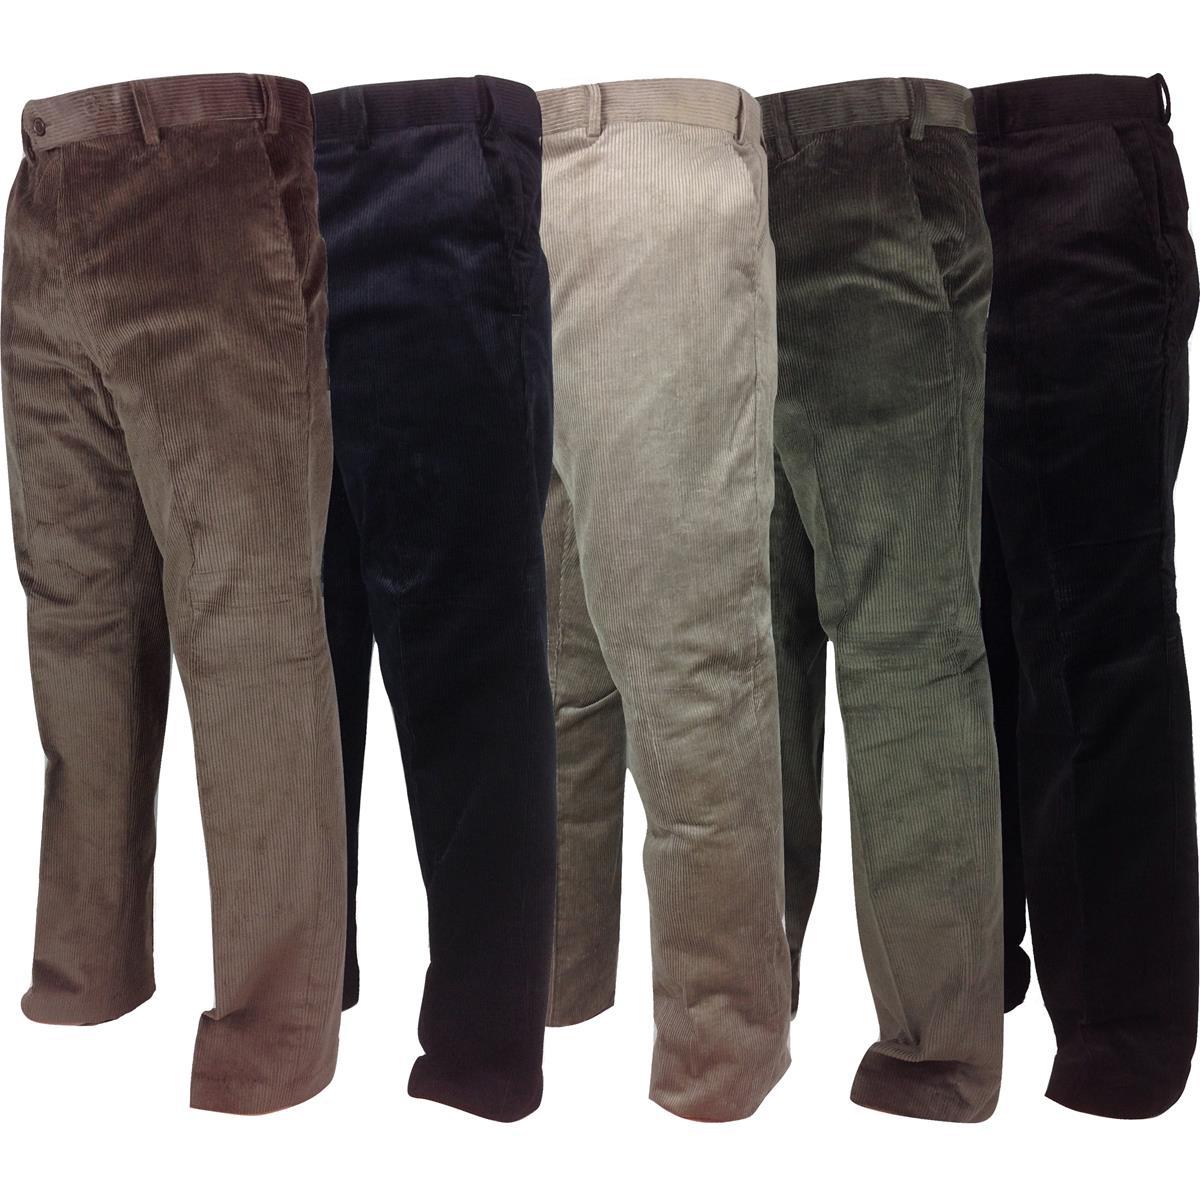 Extra Short Mens Jeans